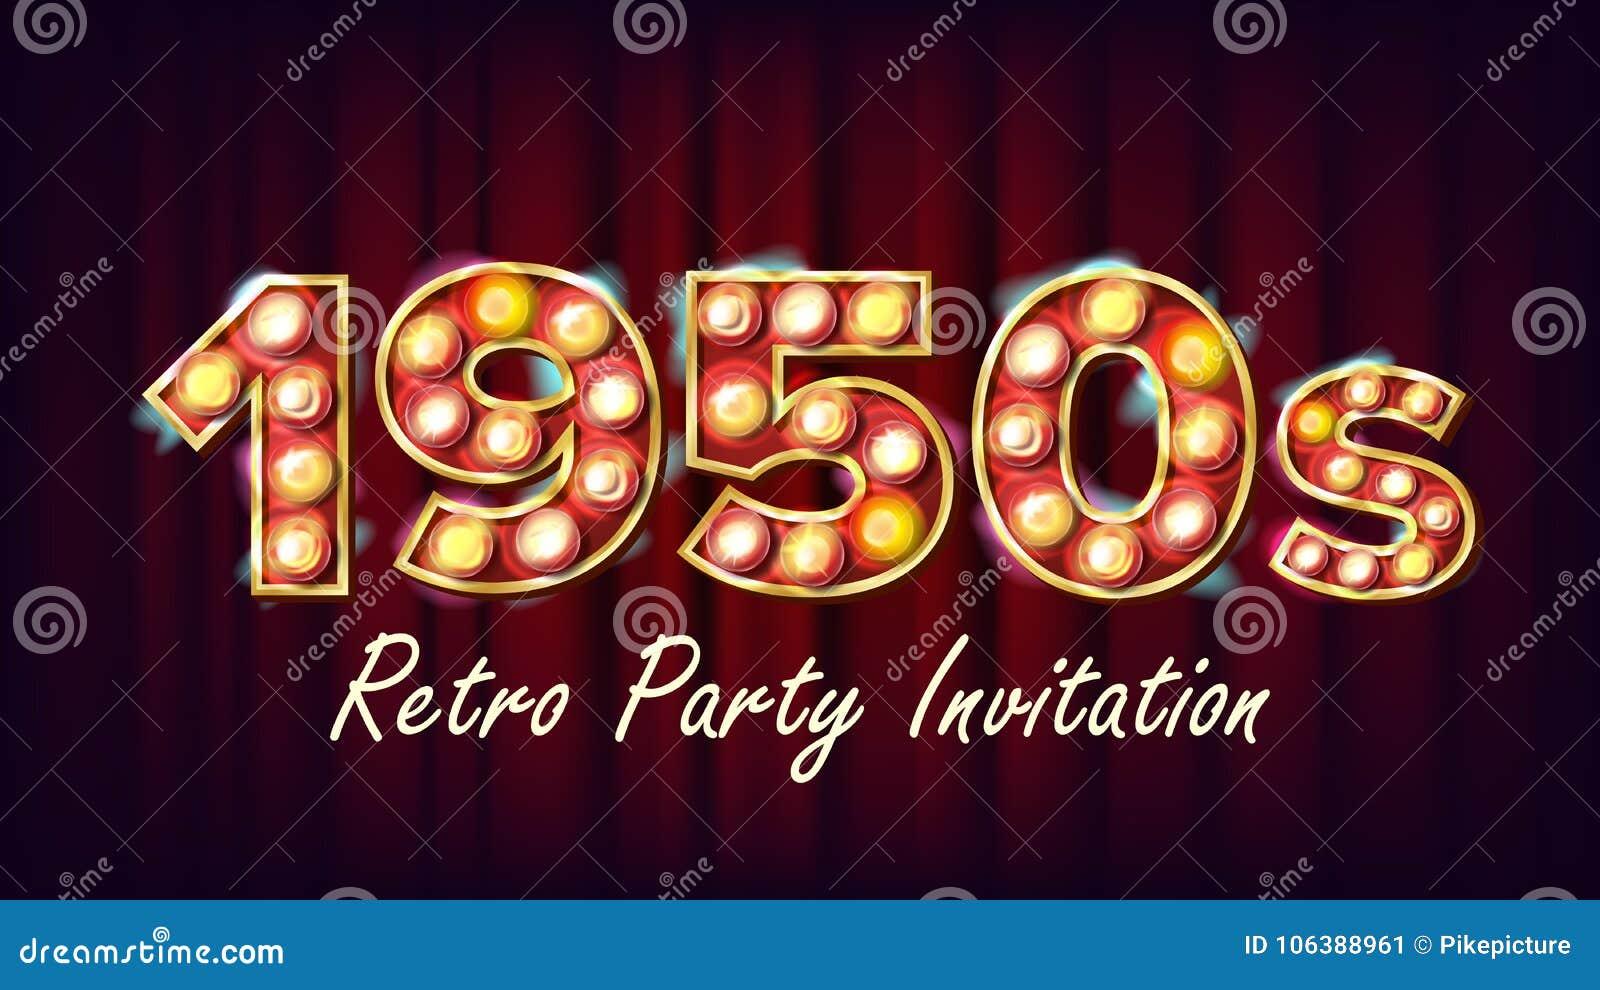 1950s Retro Party Invitation Vector. 1950 Style Design. Shine Lamp Bulb. Glowing Digit. Illuminated Retro Poster, Flyer